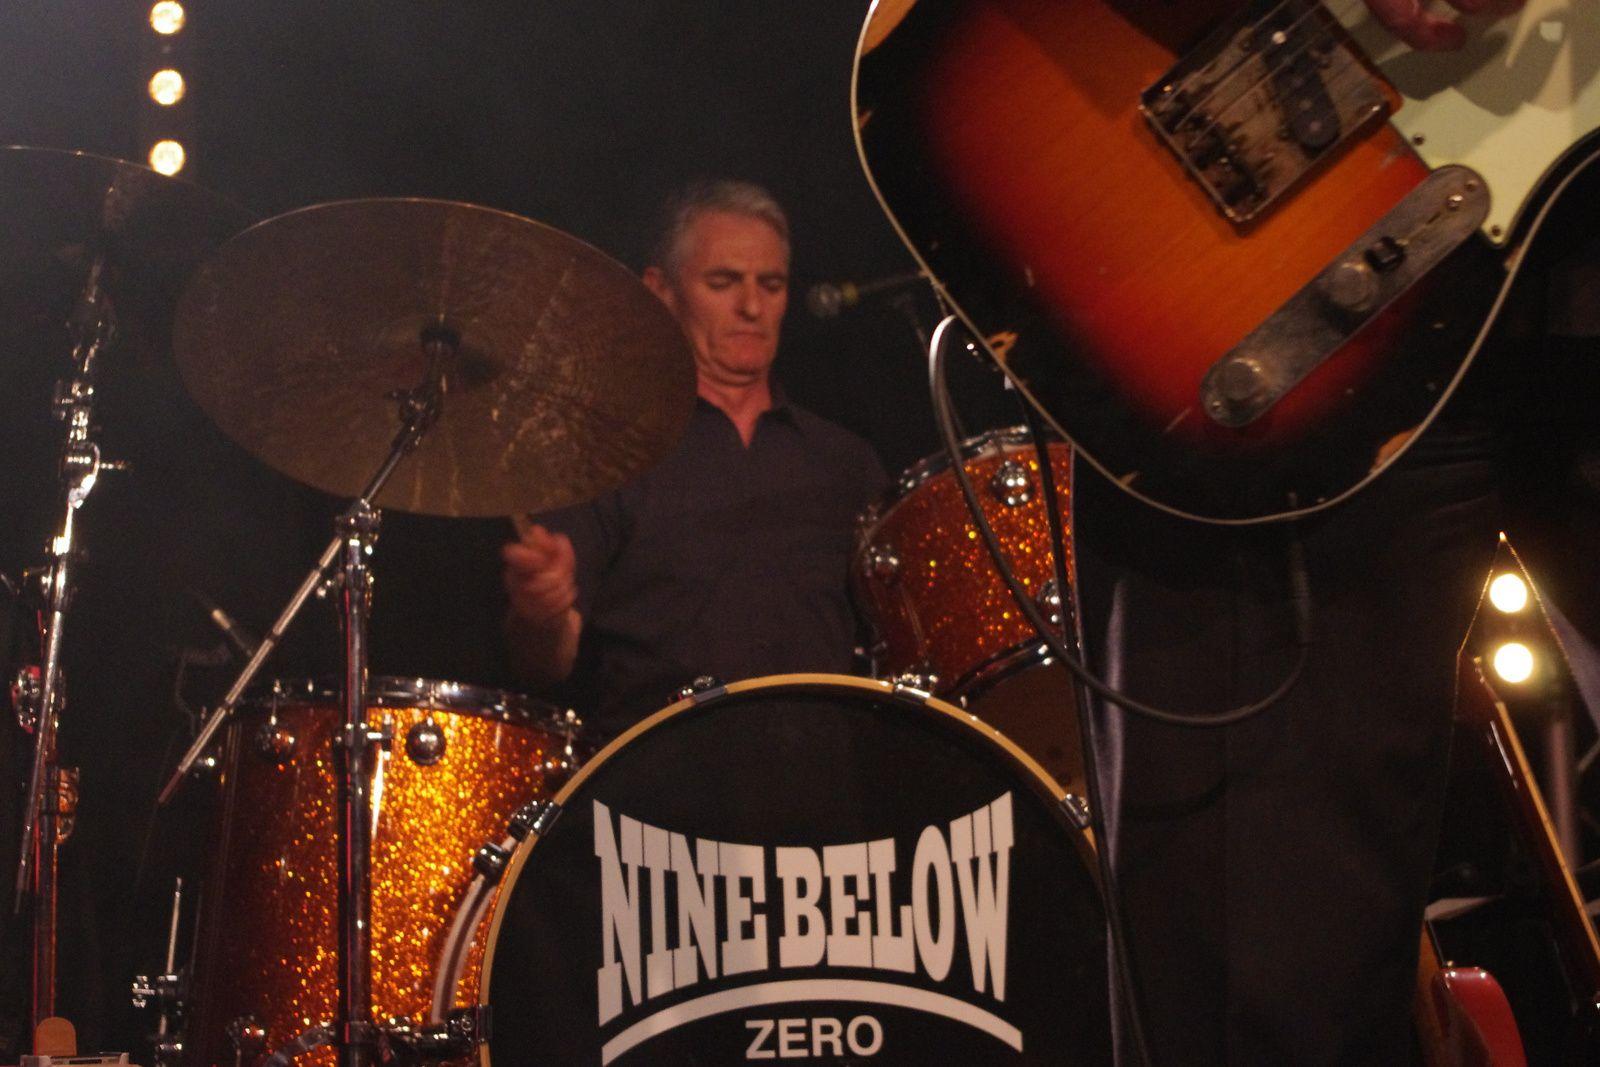 Nine Below Zero - 05 juin 2014 - La Boîte à Musiques, Wattrelos (59)